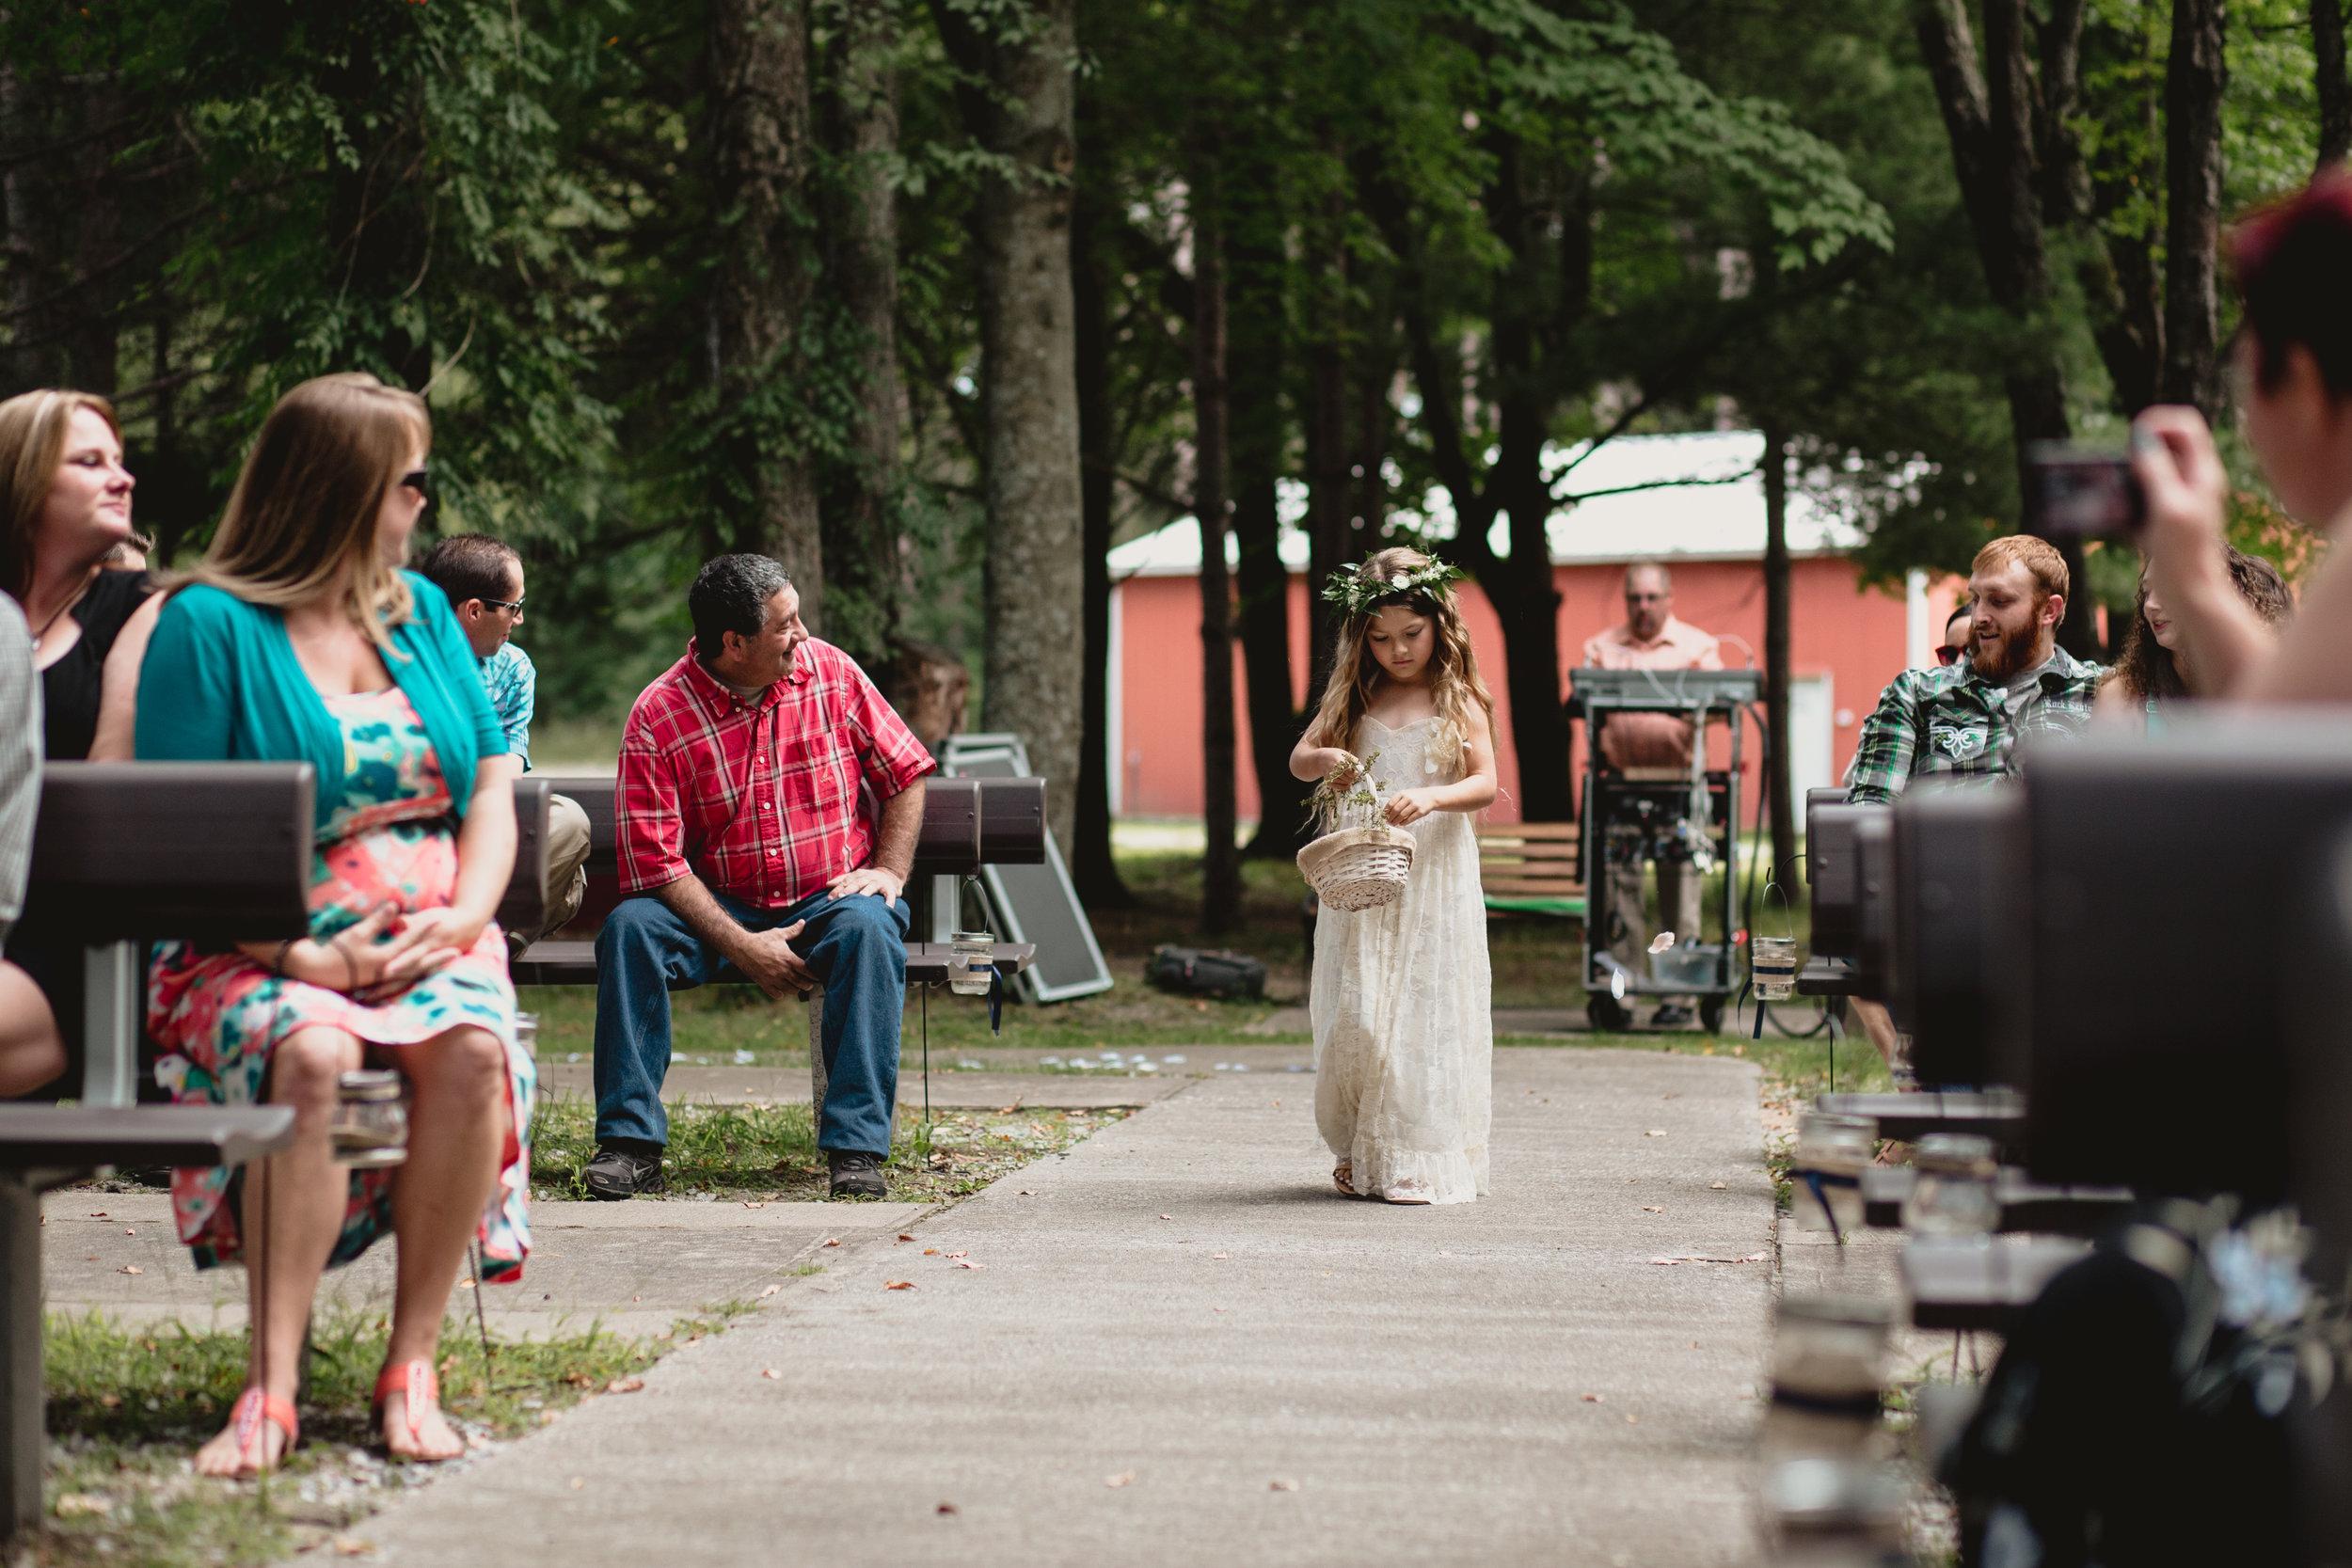 west-michigan-wedding-photographer-whitehall-rachel-austin-chapel-in-the-pines-222.jpg